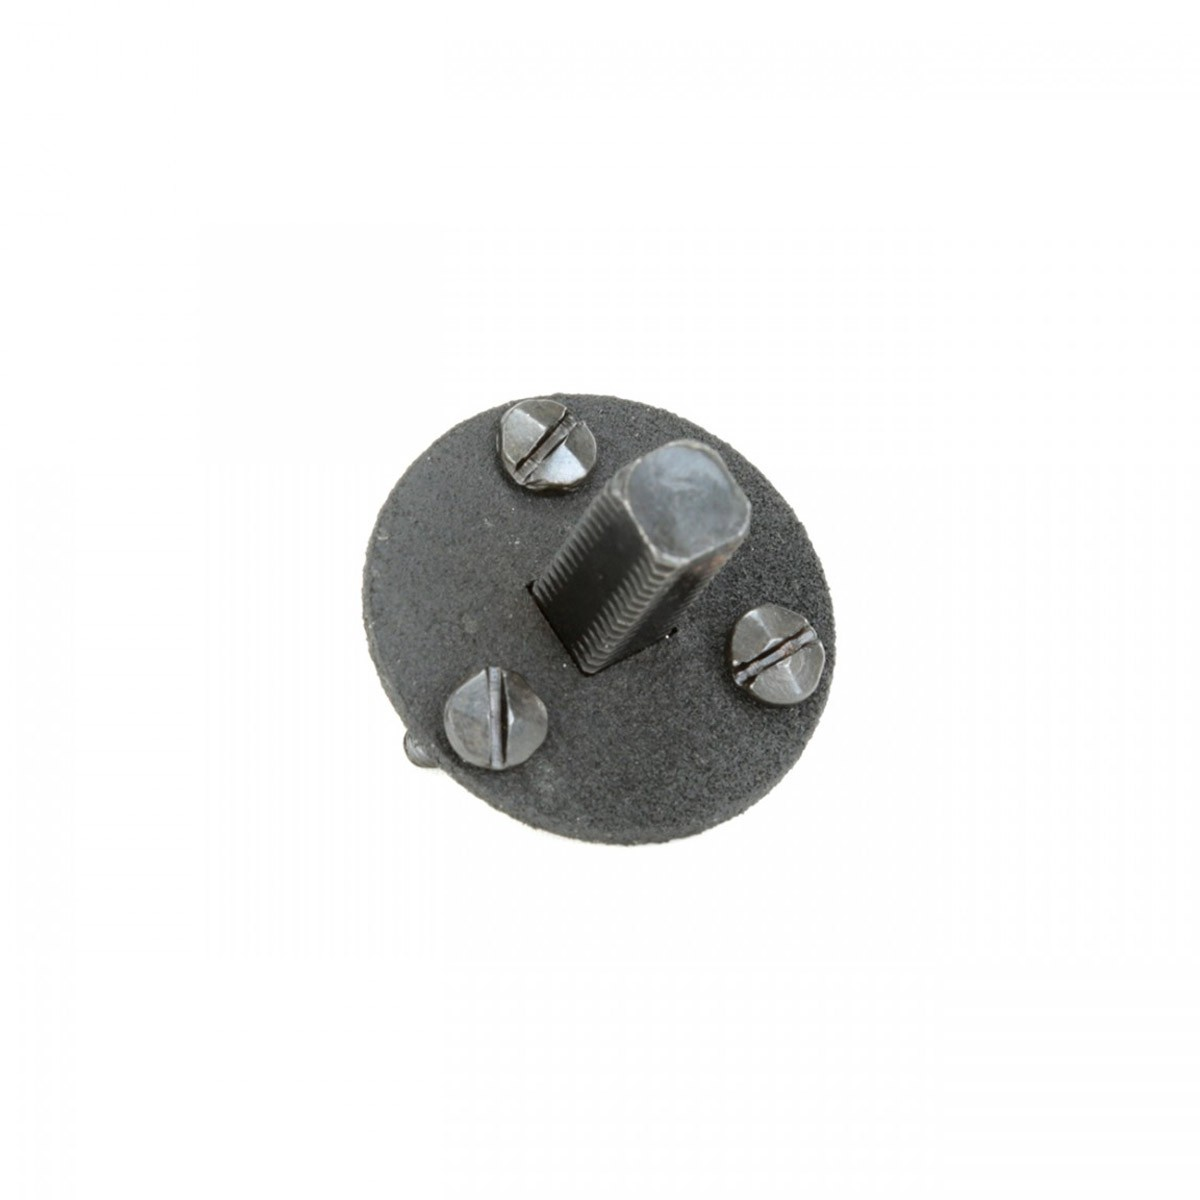 Steel Doorknob Dummy Spindle 138 Vintage Style Pack of 4 Door Knob Steel Door Knob dummy door knobs